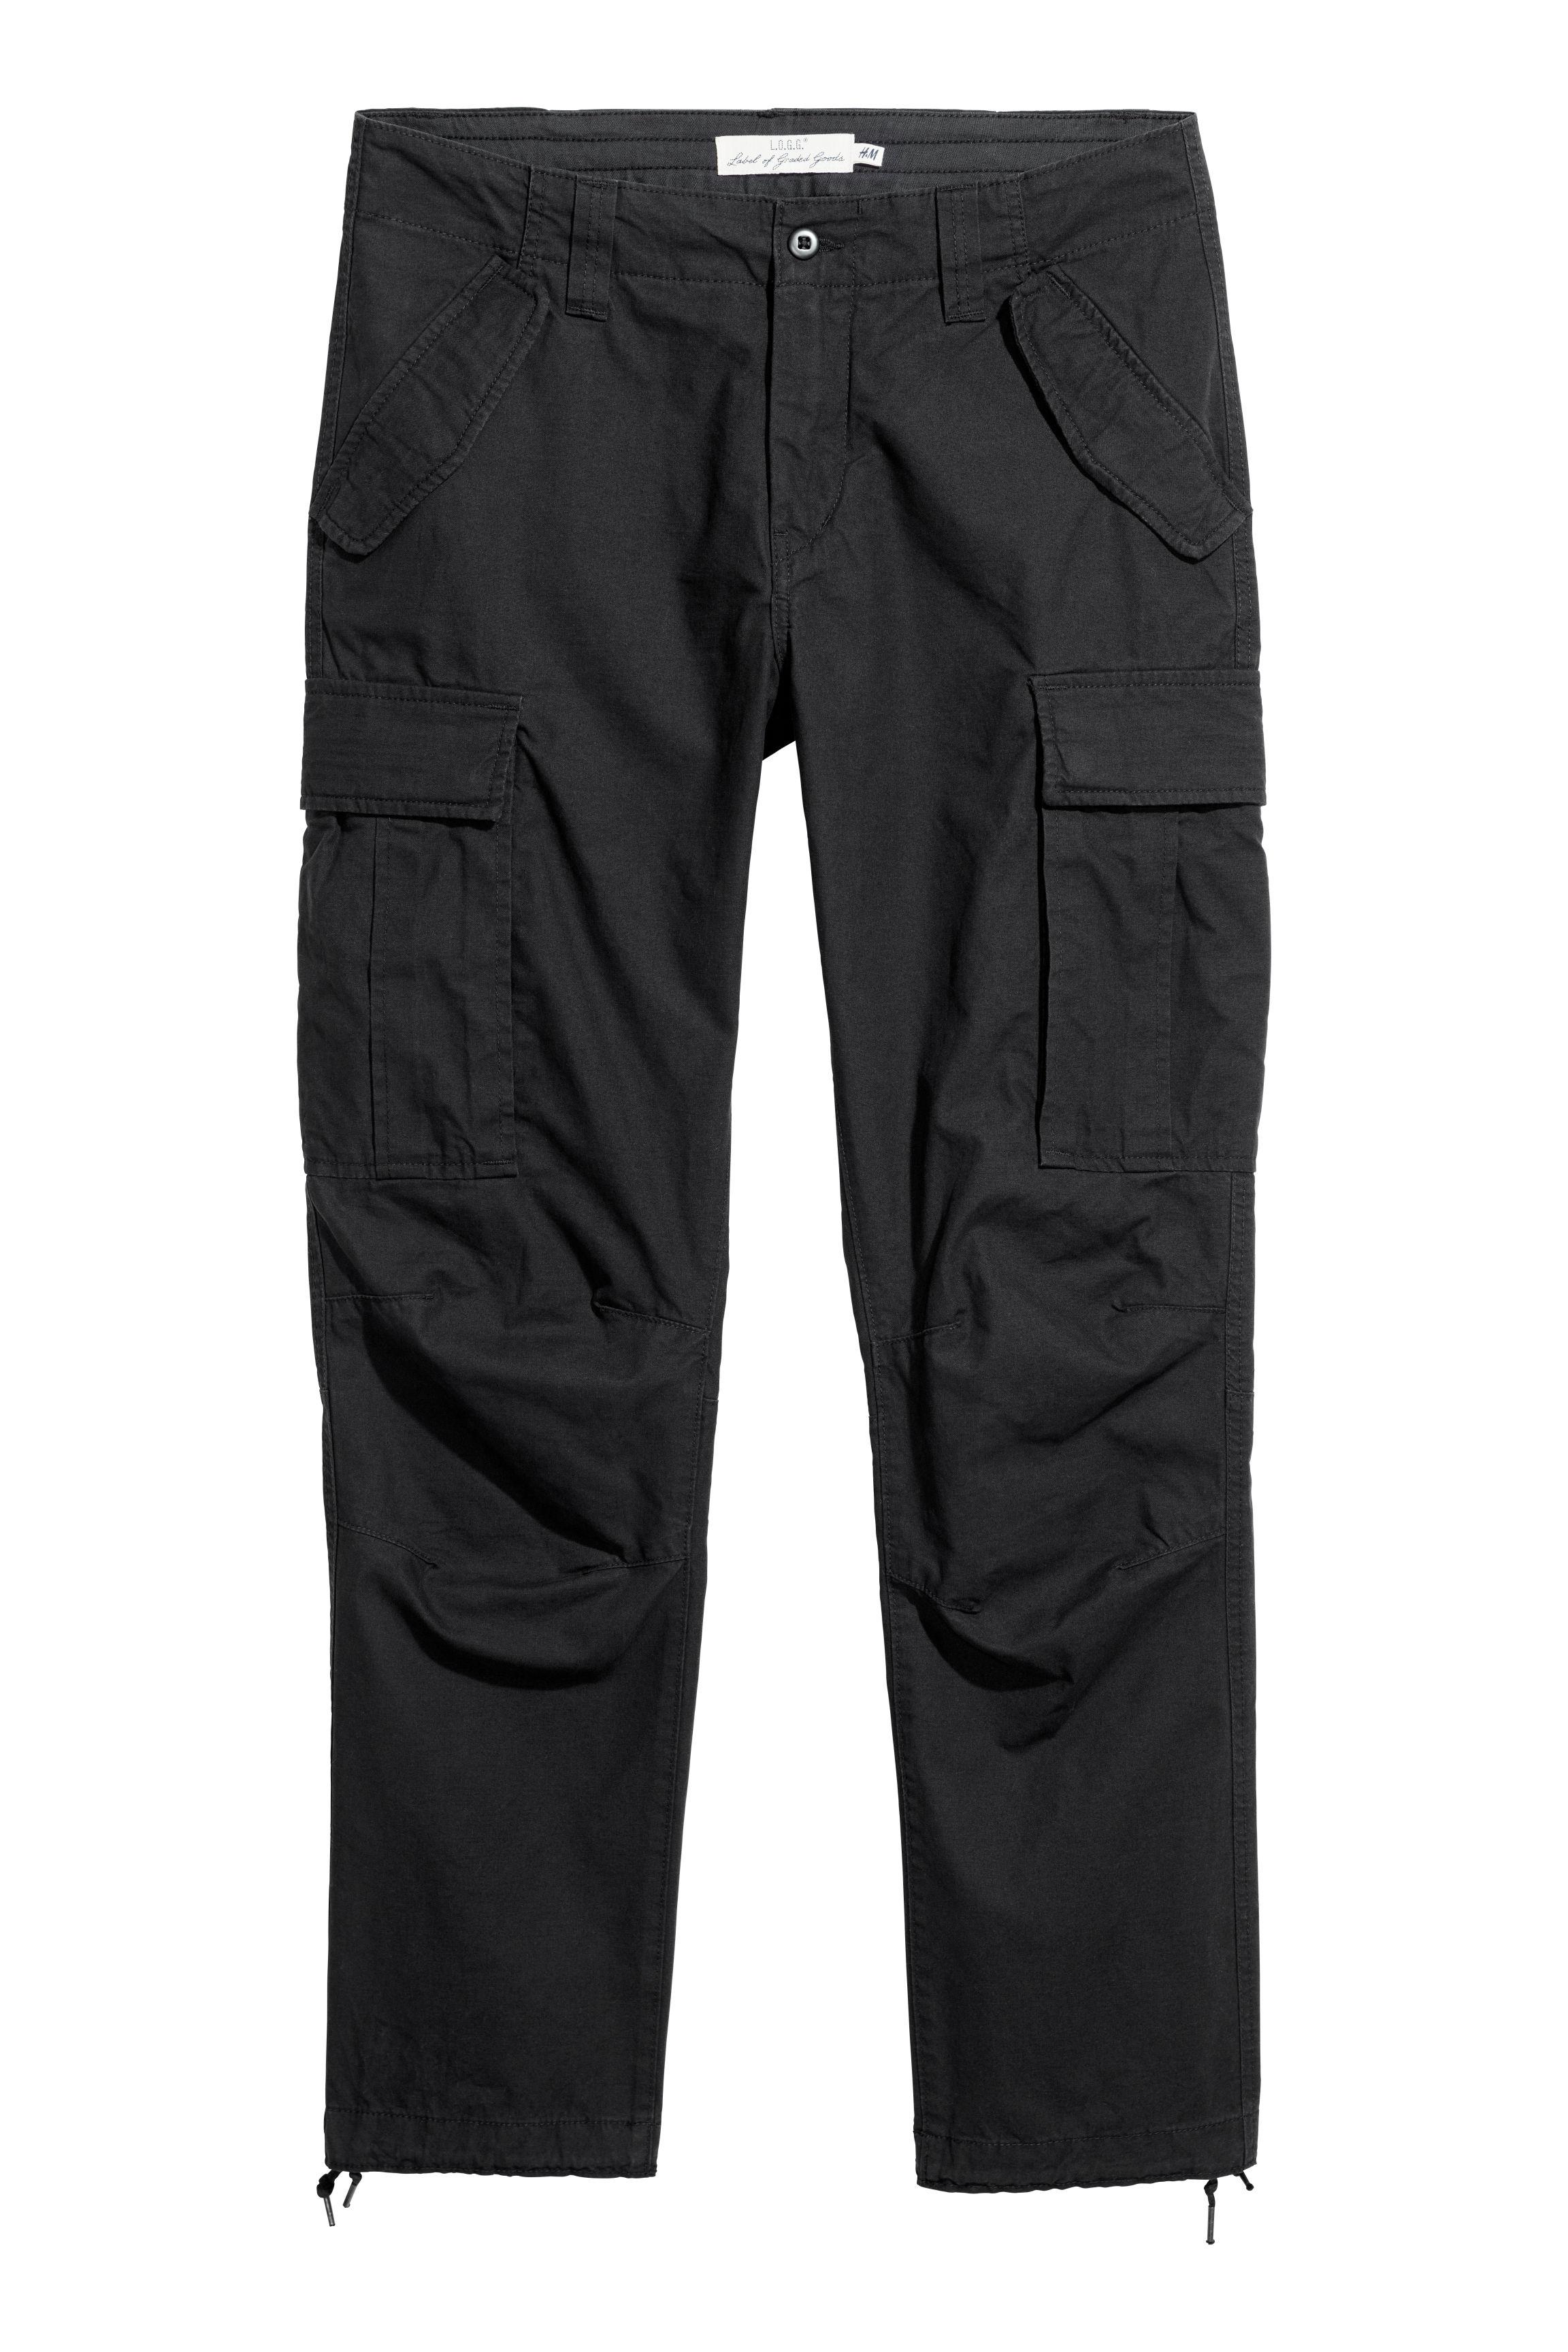 Cargo Pants - Black - Men  8940366b38f